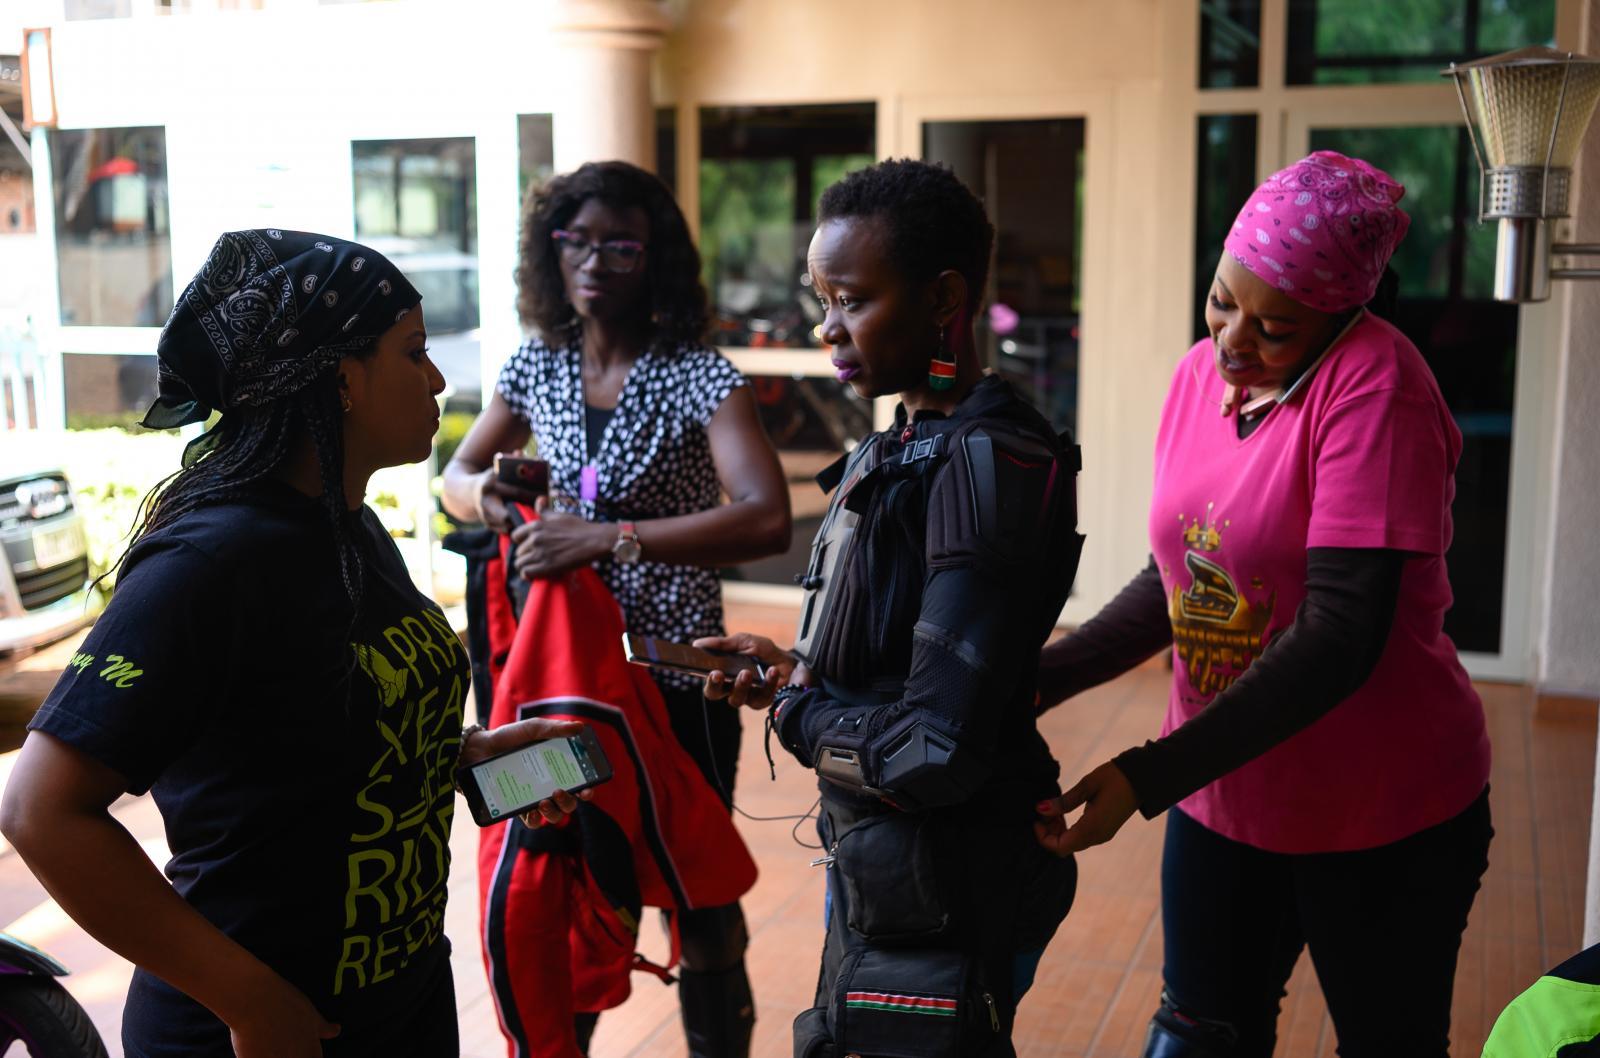 Photography image - Loading ThrottleQueens_Kigali_042319_72DPI-3.jpg